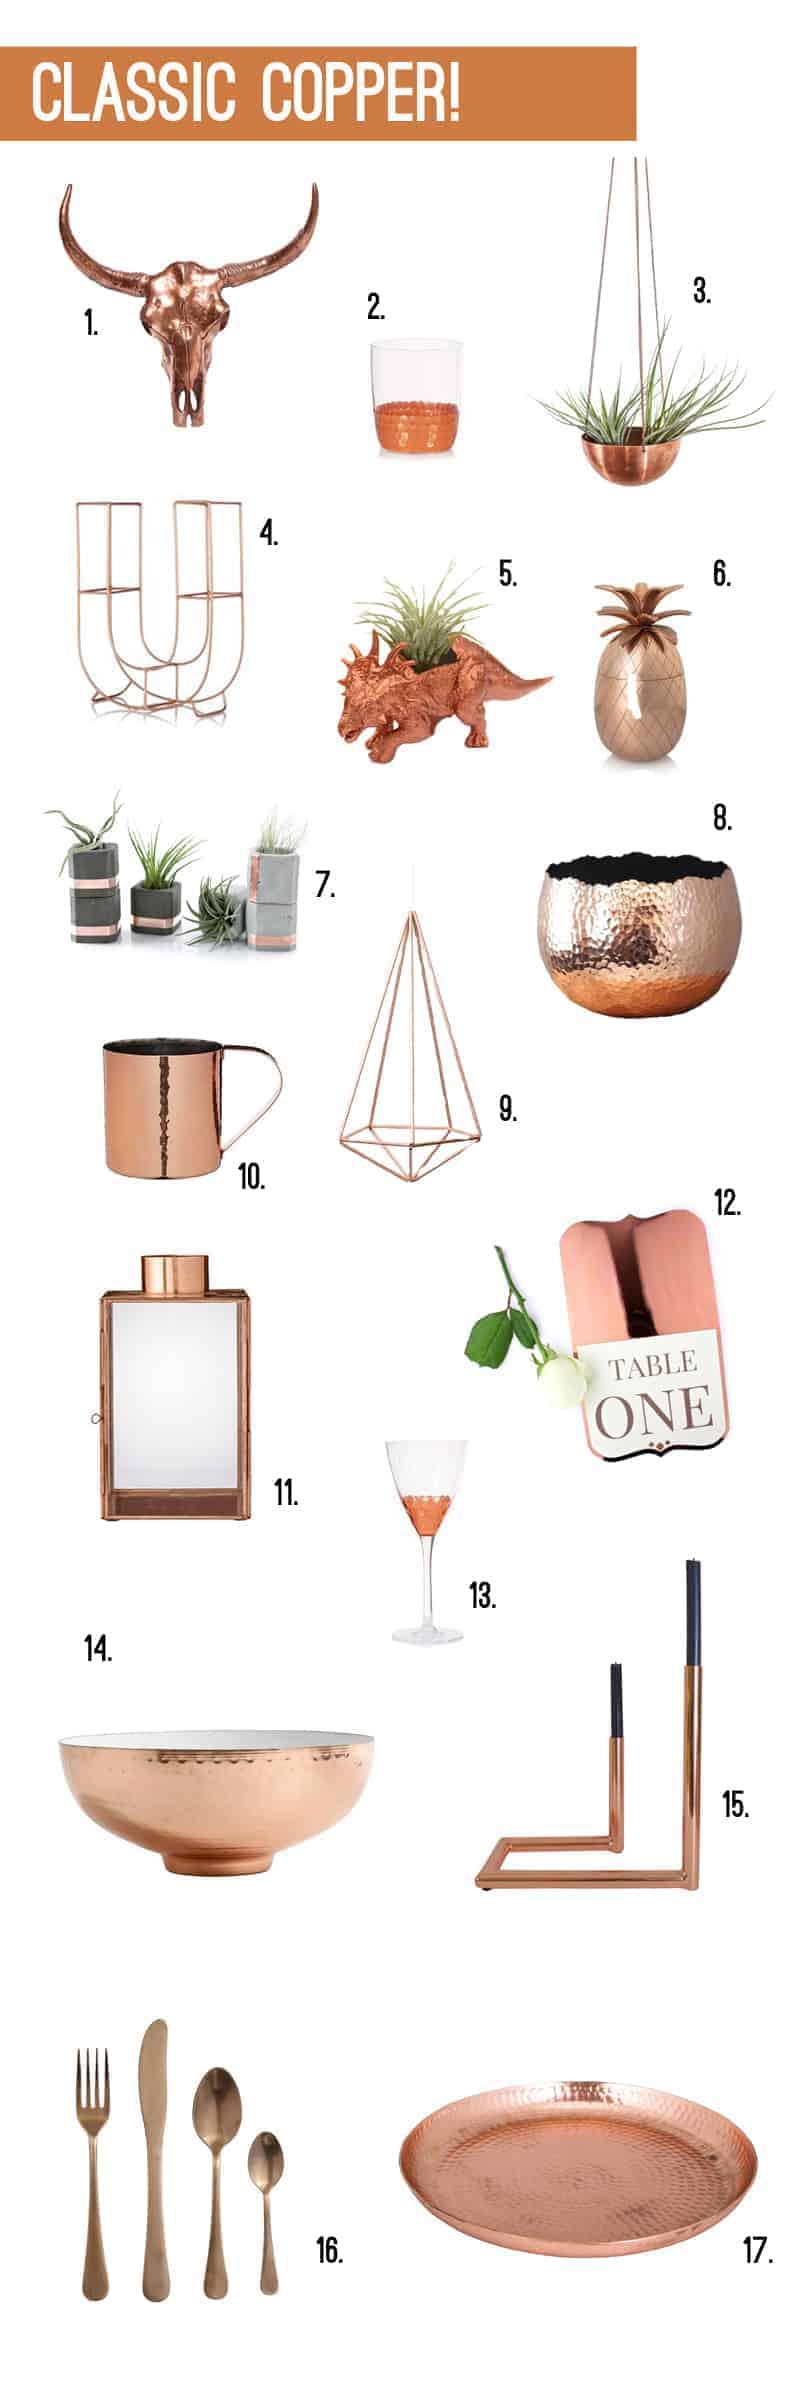 Classic Copper - Wedding Accessories 2